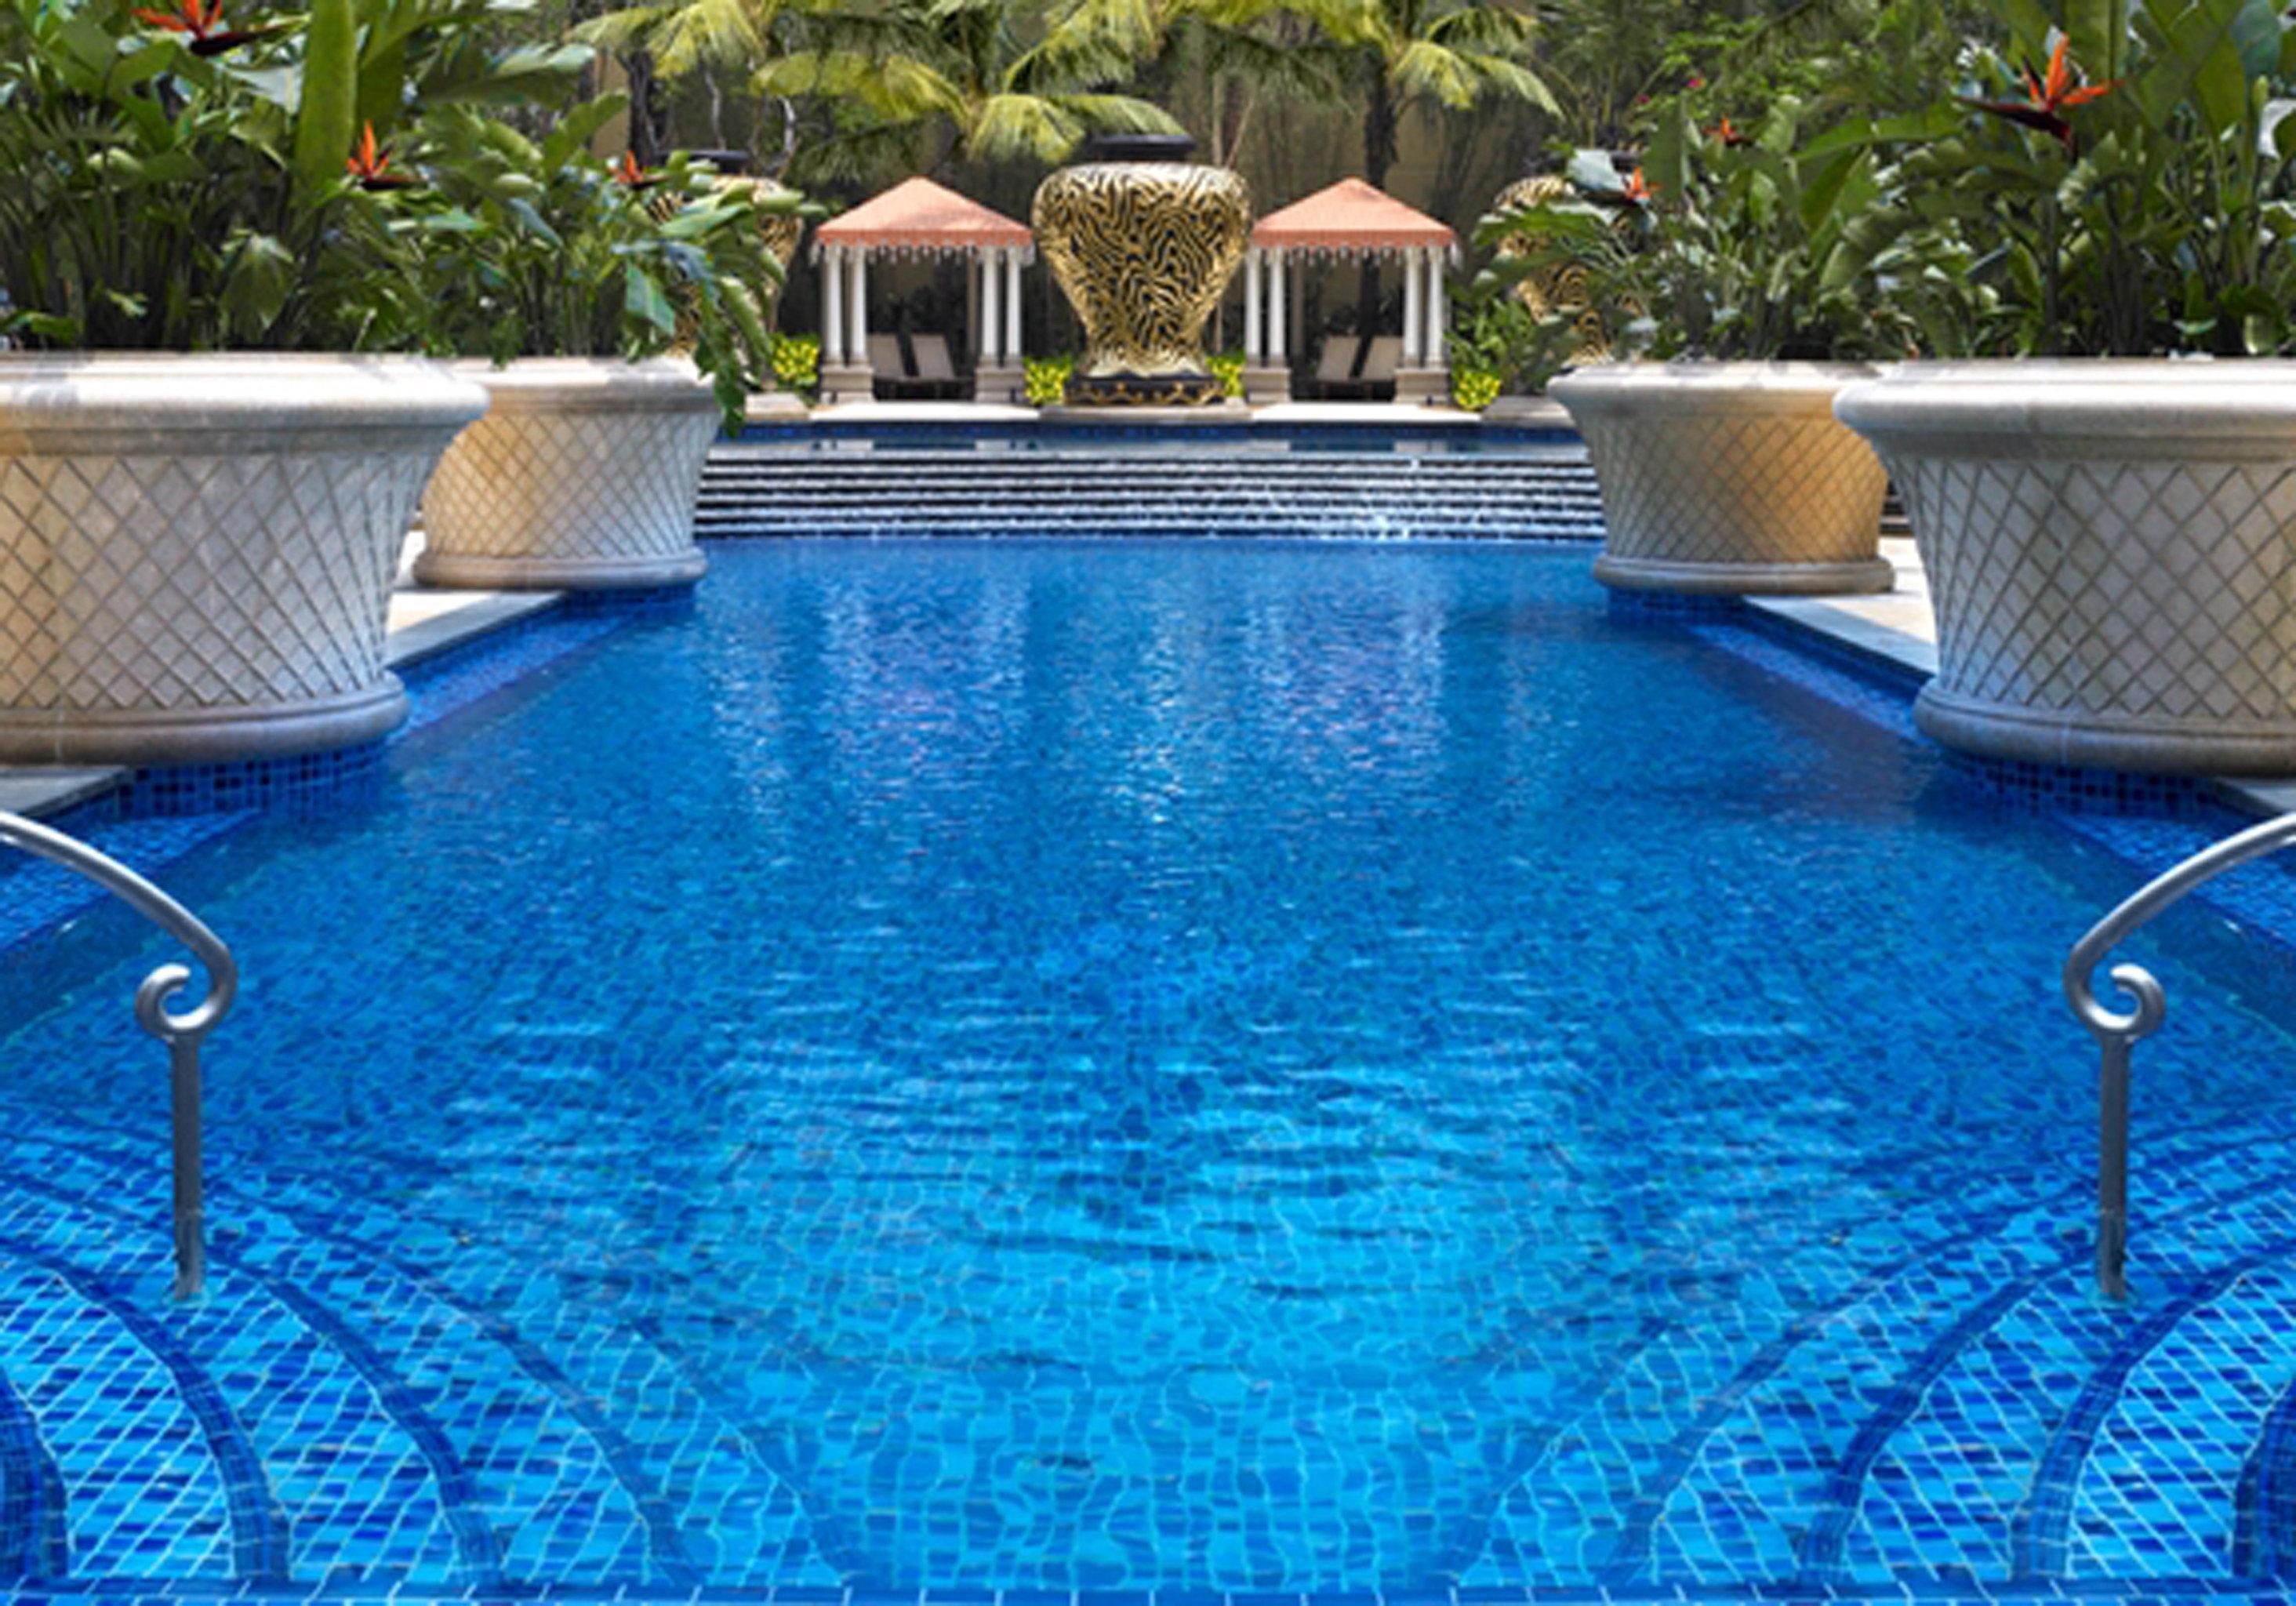 Lounge Pool swimming pool property backyard reflecting pool Villa blue